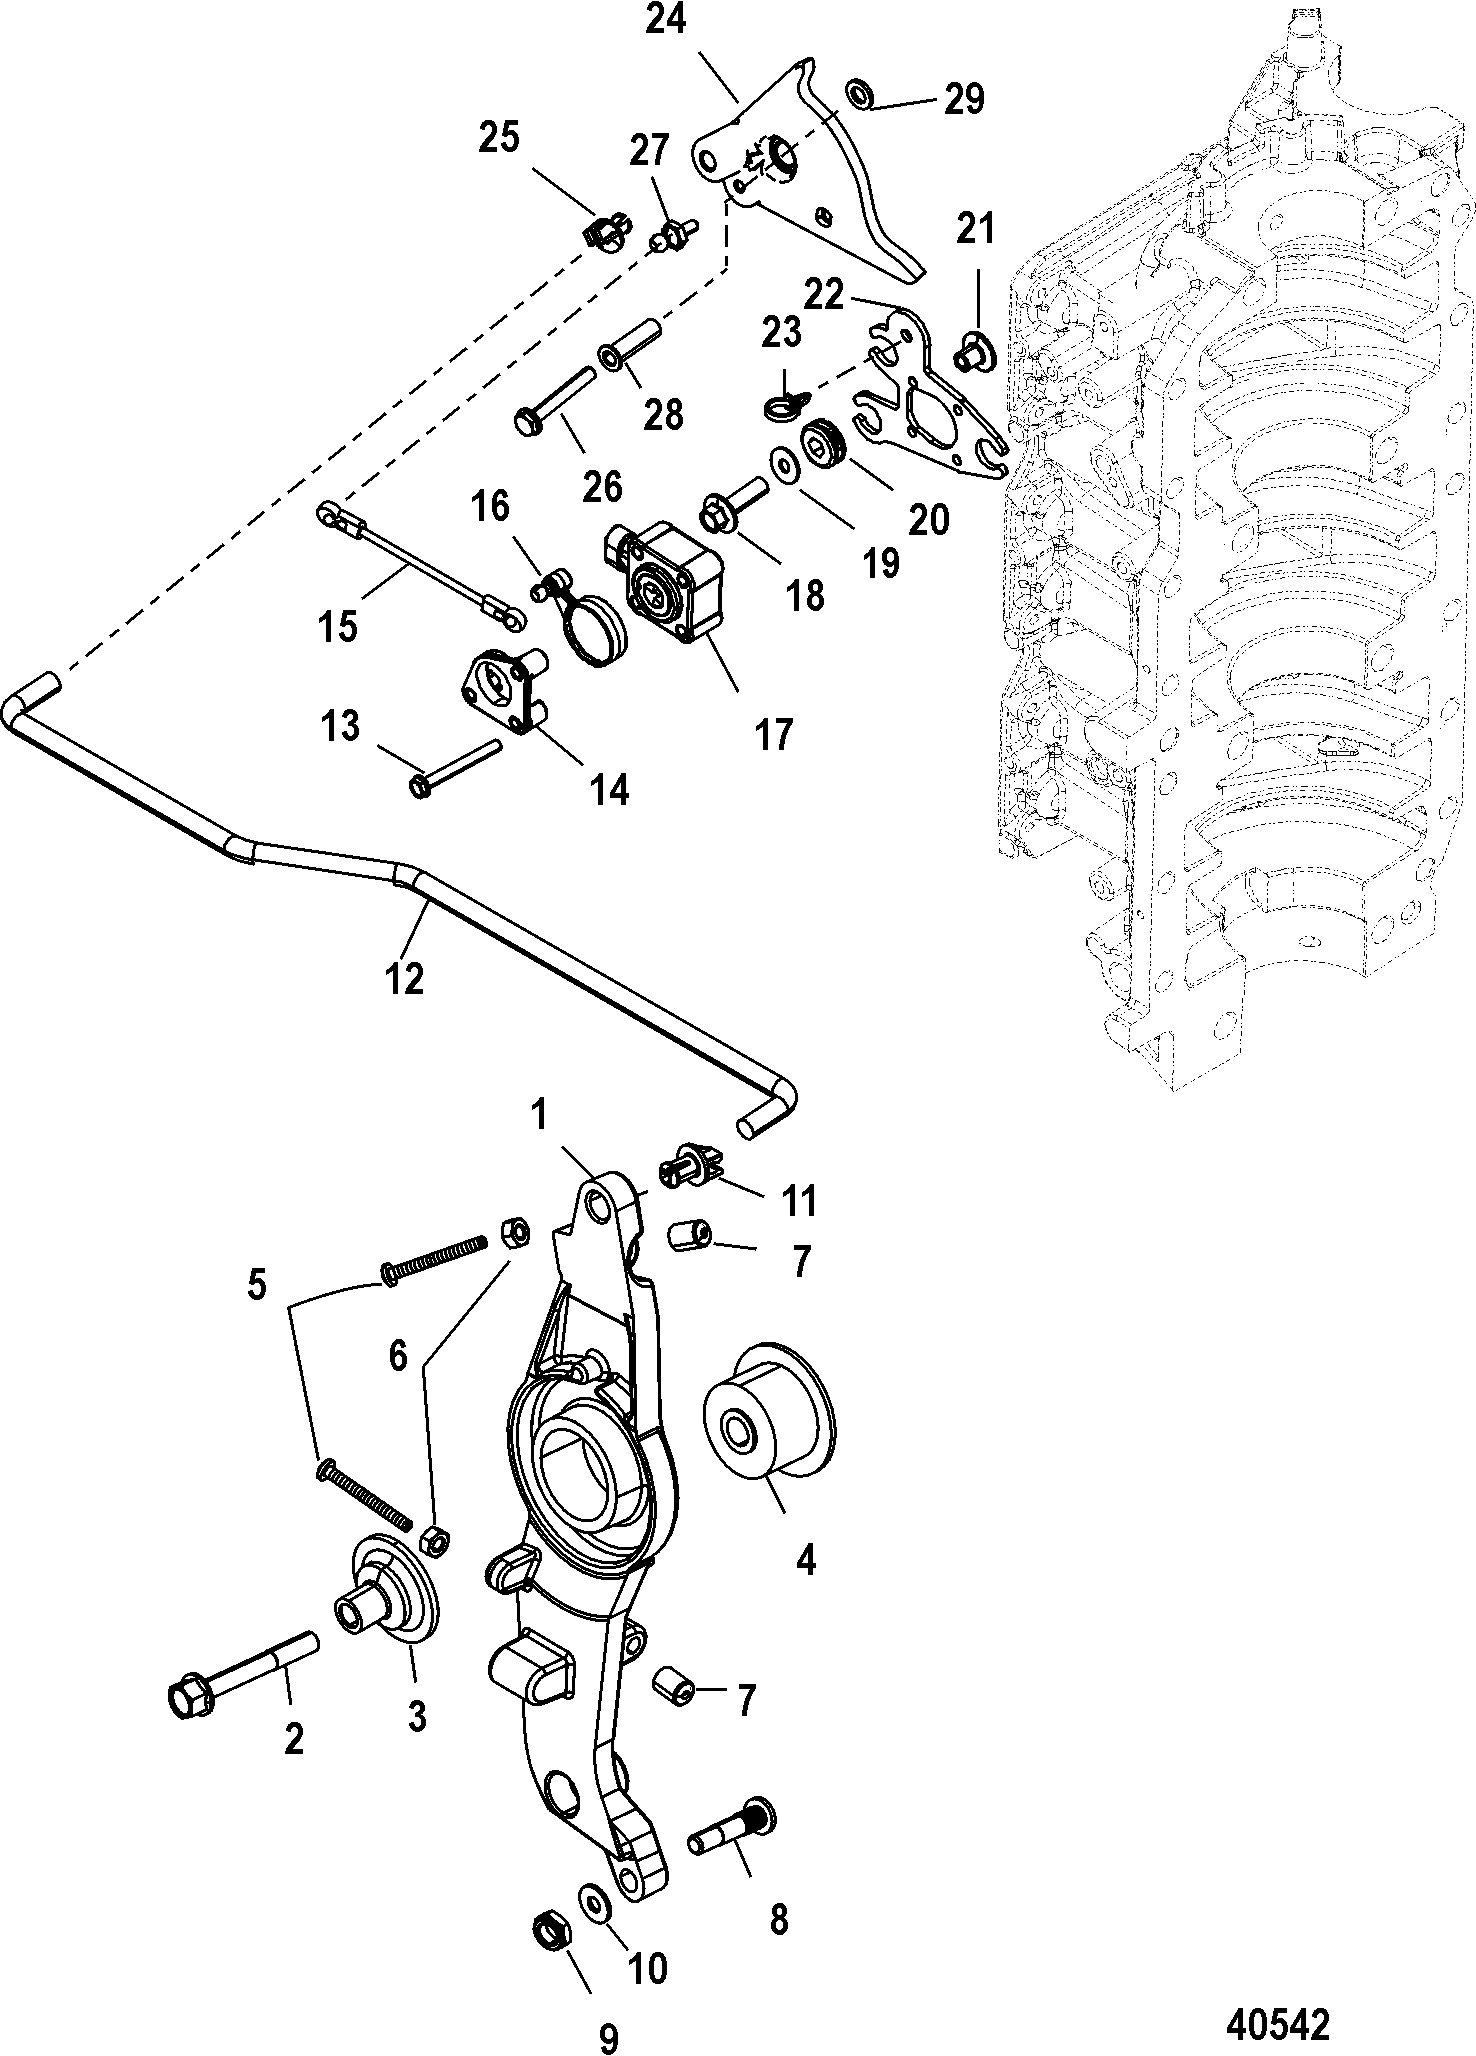 wiring harness diagram deh 23ub